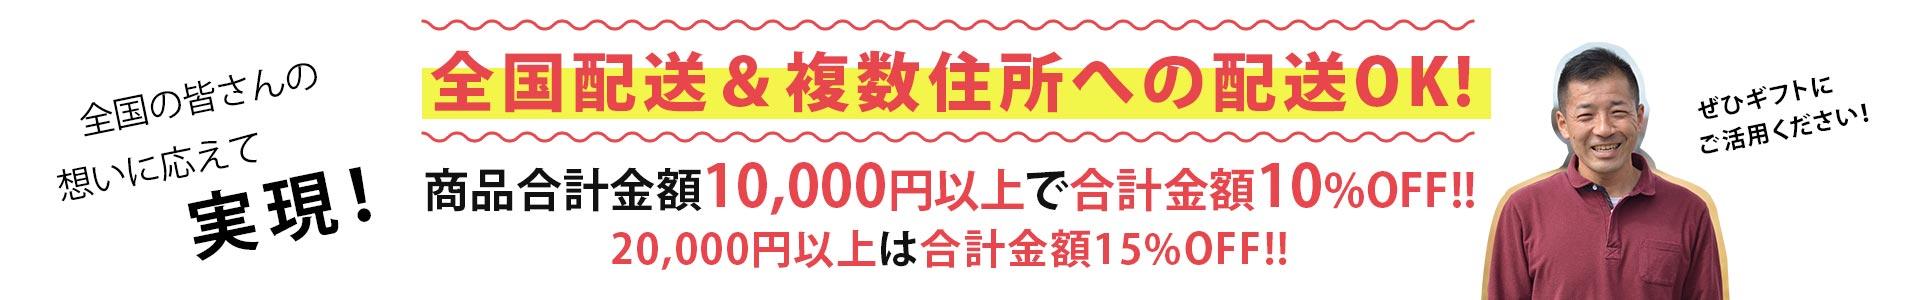 全国配送&複数住所への配送OK!商品合計金額10,000円以上で合計金額10%OFF!!20,000円以上は合計金額15%OFF!!